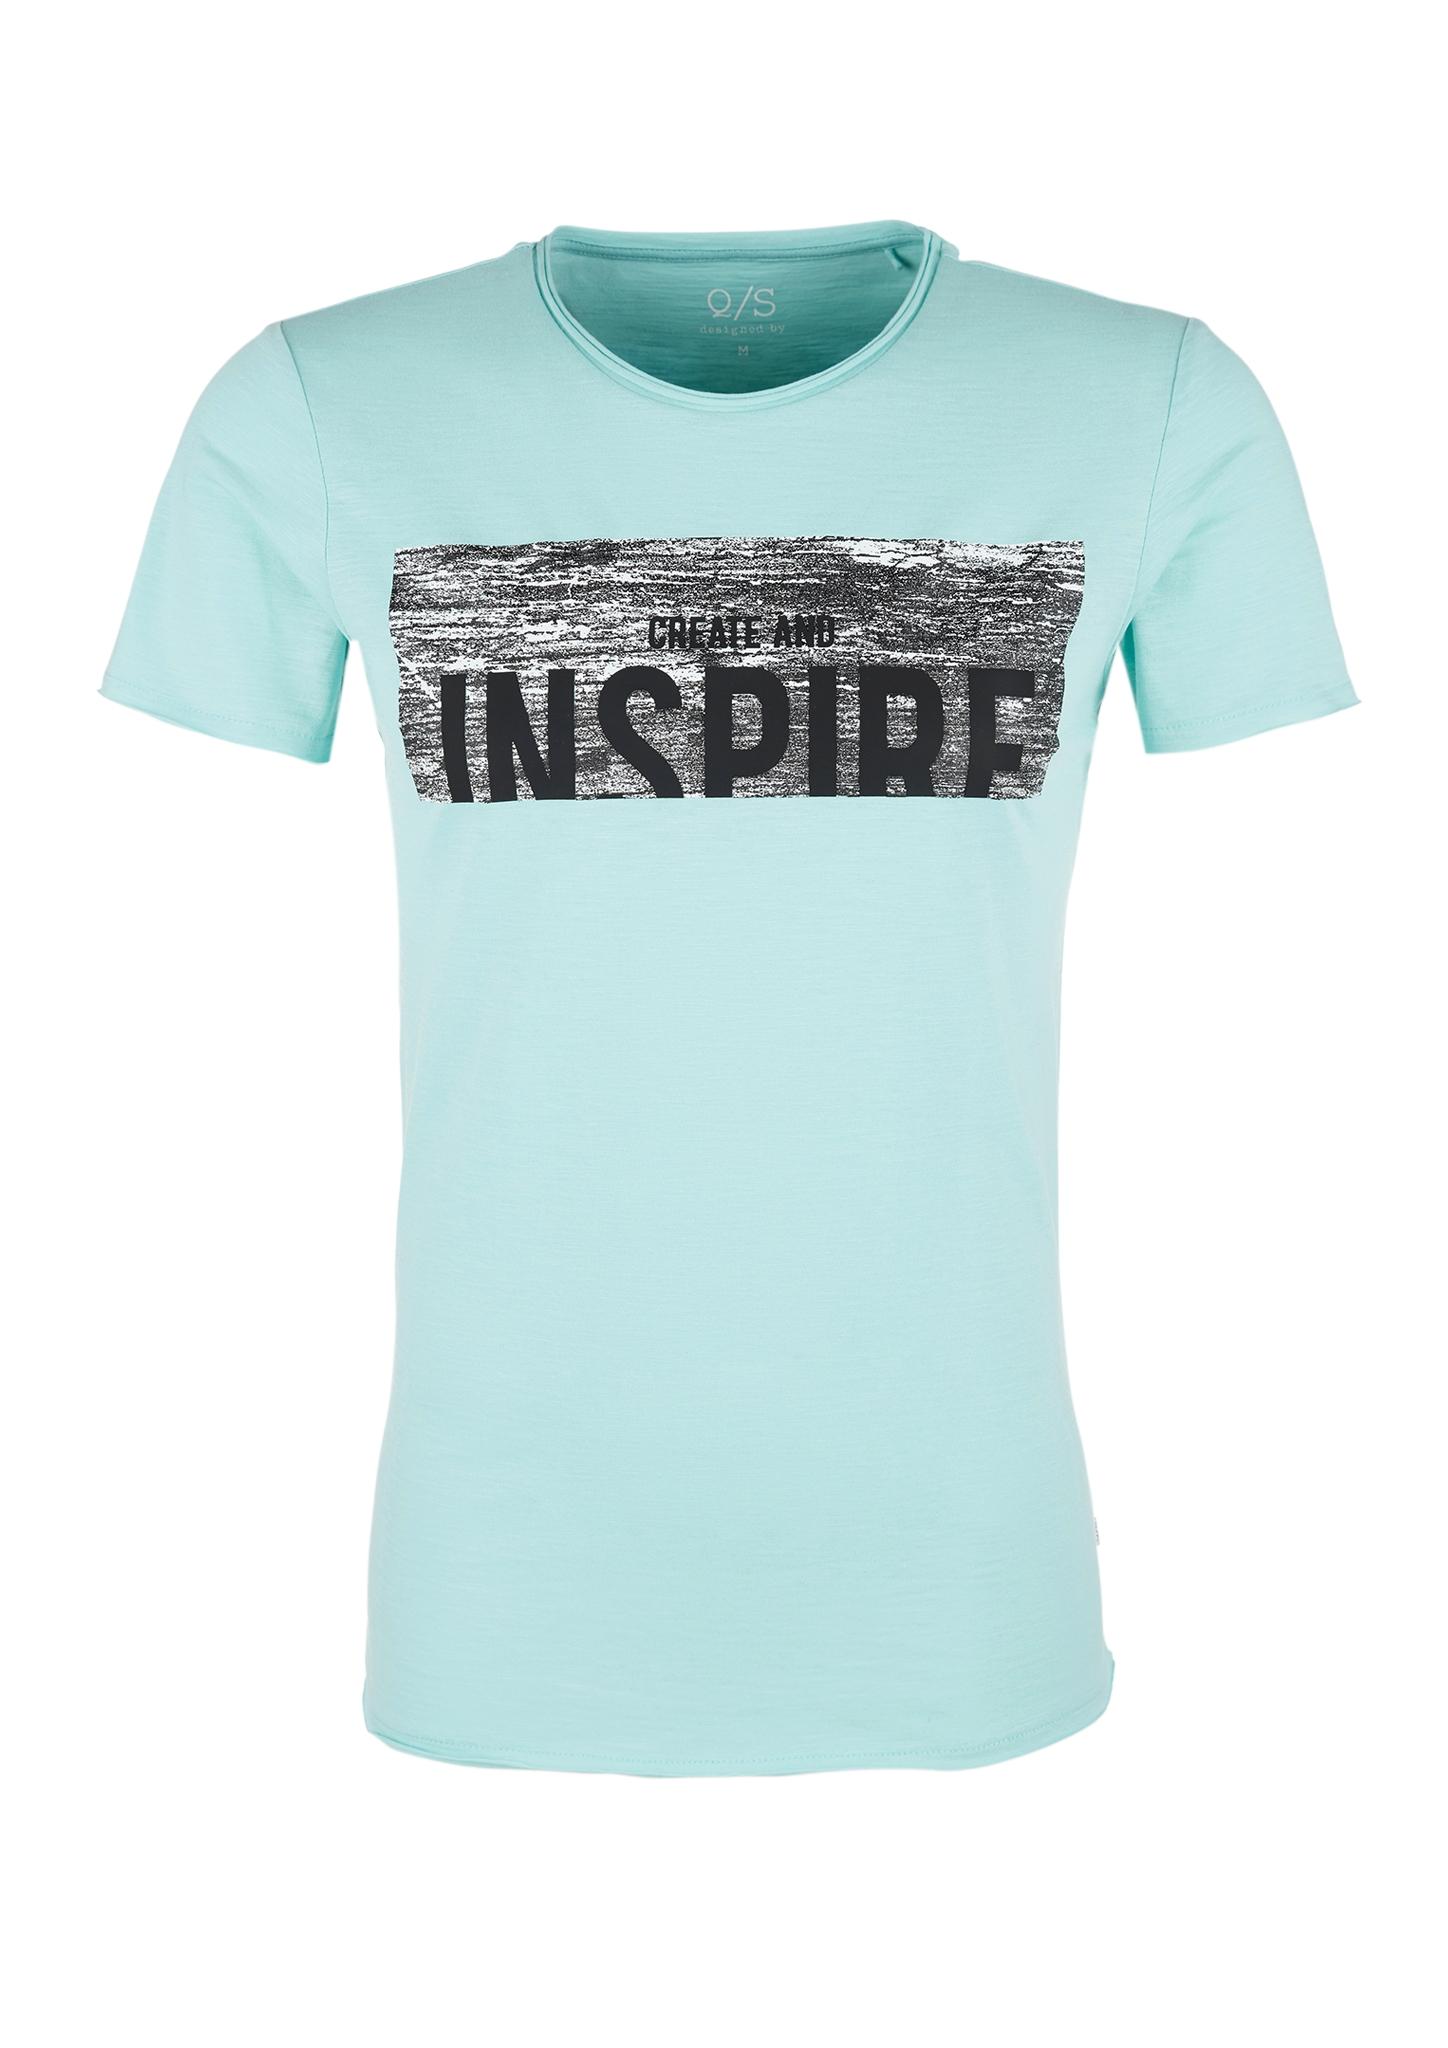 Flammgarm-Shirt | Bekleidung | Blau/grün | 100% baumwolle | Q/S designed by